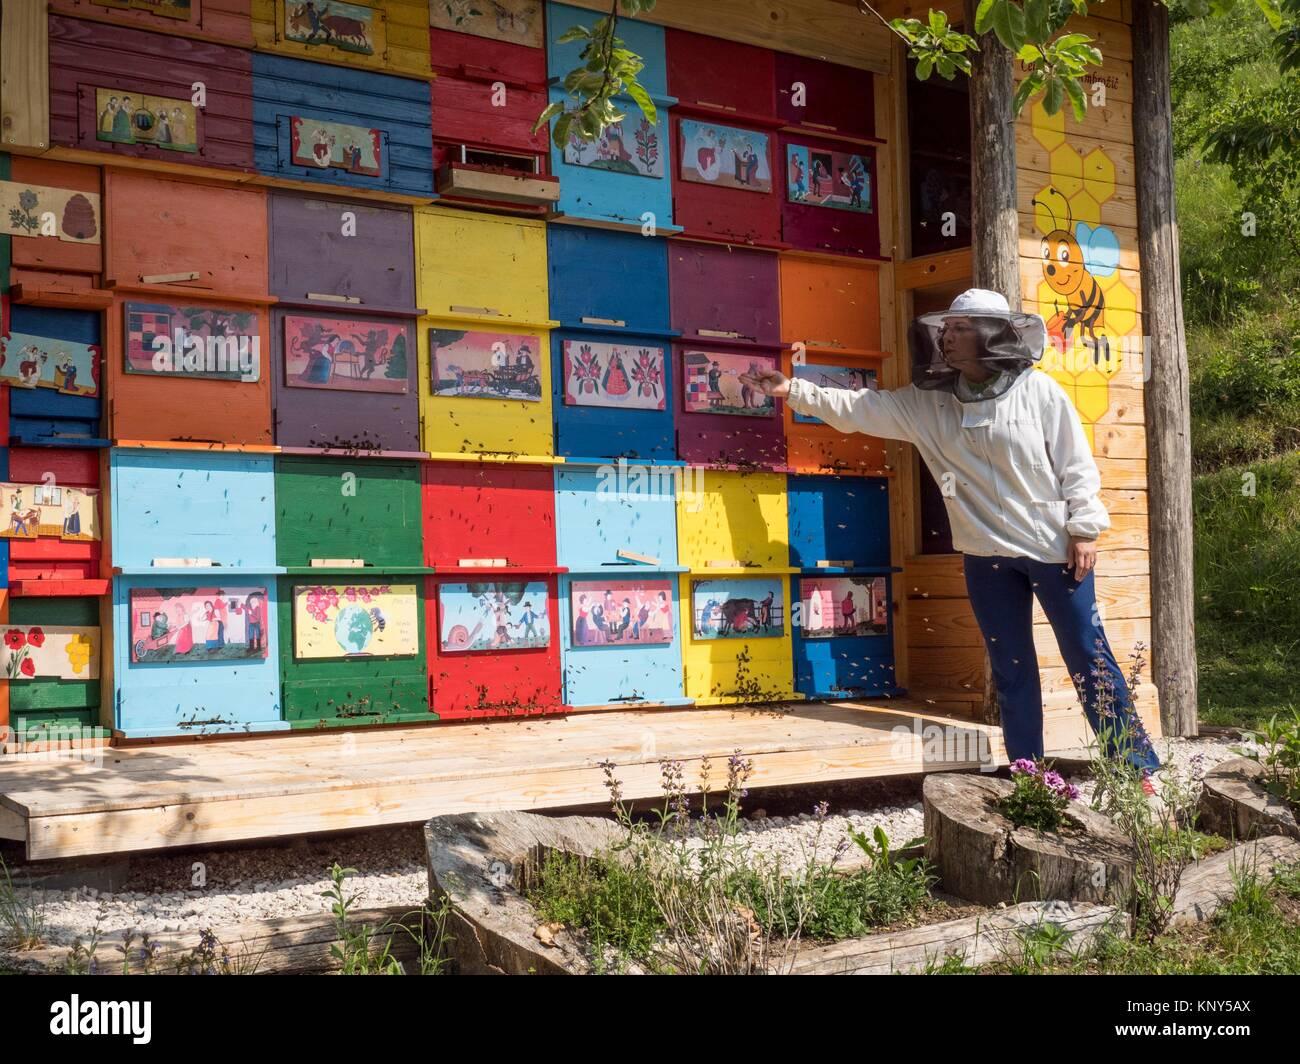 Slovenia Bumble Bees Beekeepeer. - Stock Image